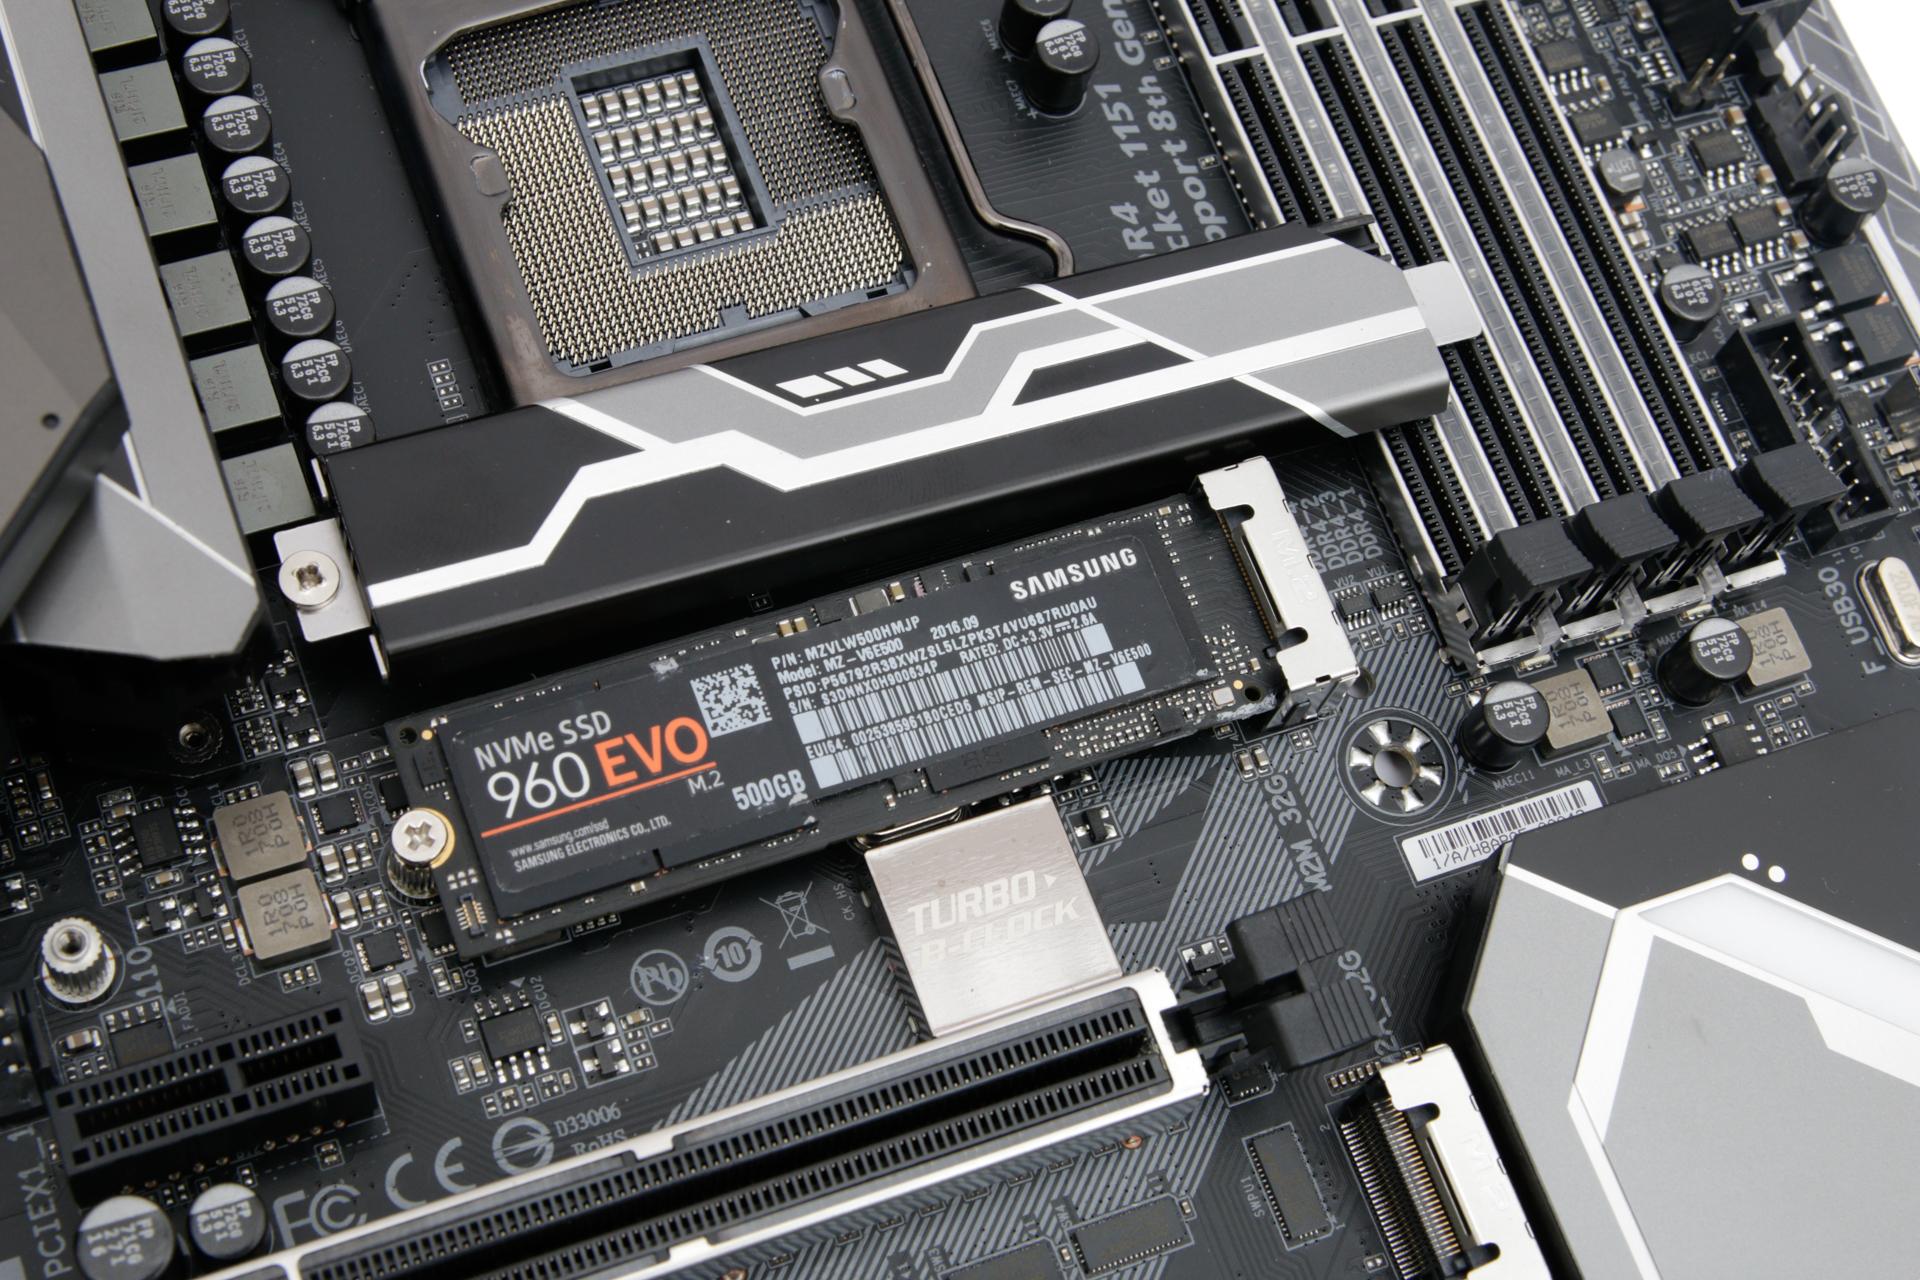 Gigabyte Z370 Aorus Gaming 7 Review | bit-tech net